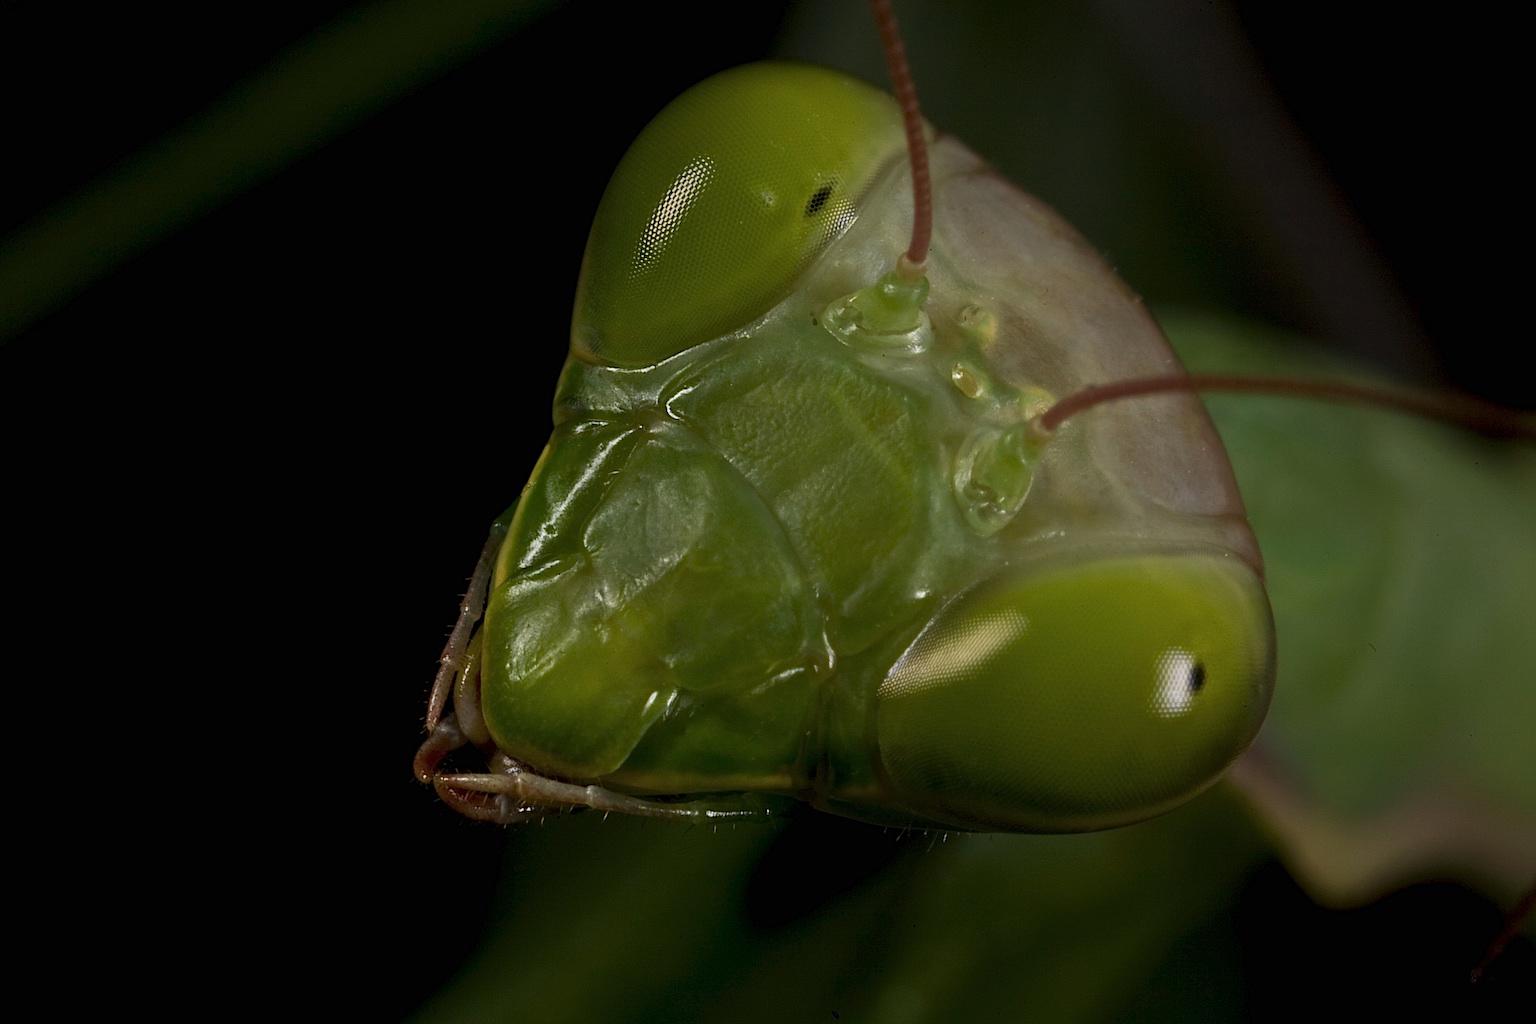 how to tell sex of praying mantis